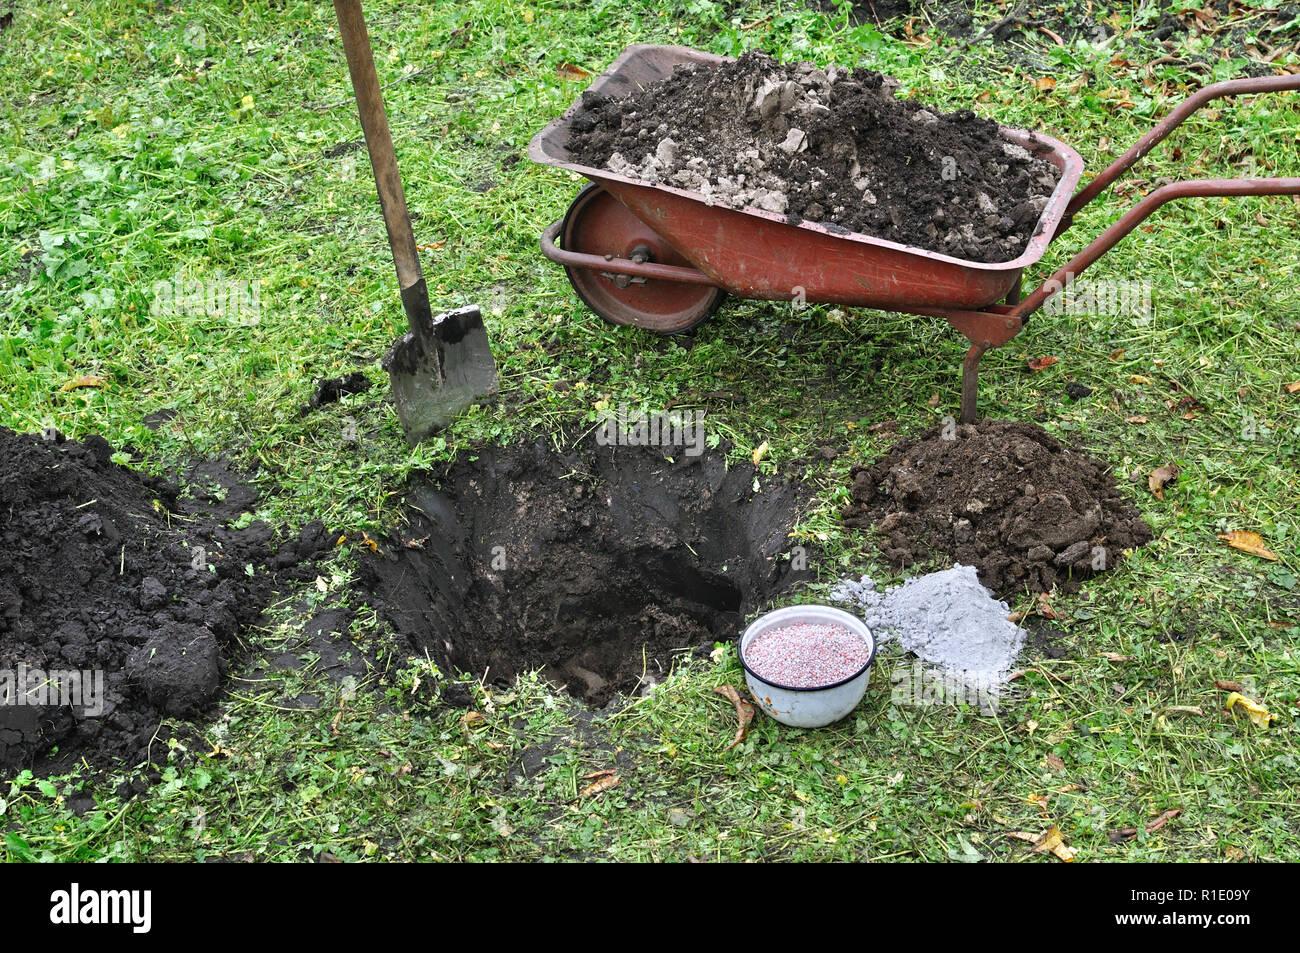 landing pit ready for planting fruit tree sapling, black earth,wheelbarrow,shovel,manure,fertilizer,ash - Stock Image